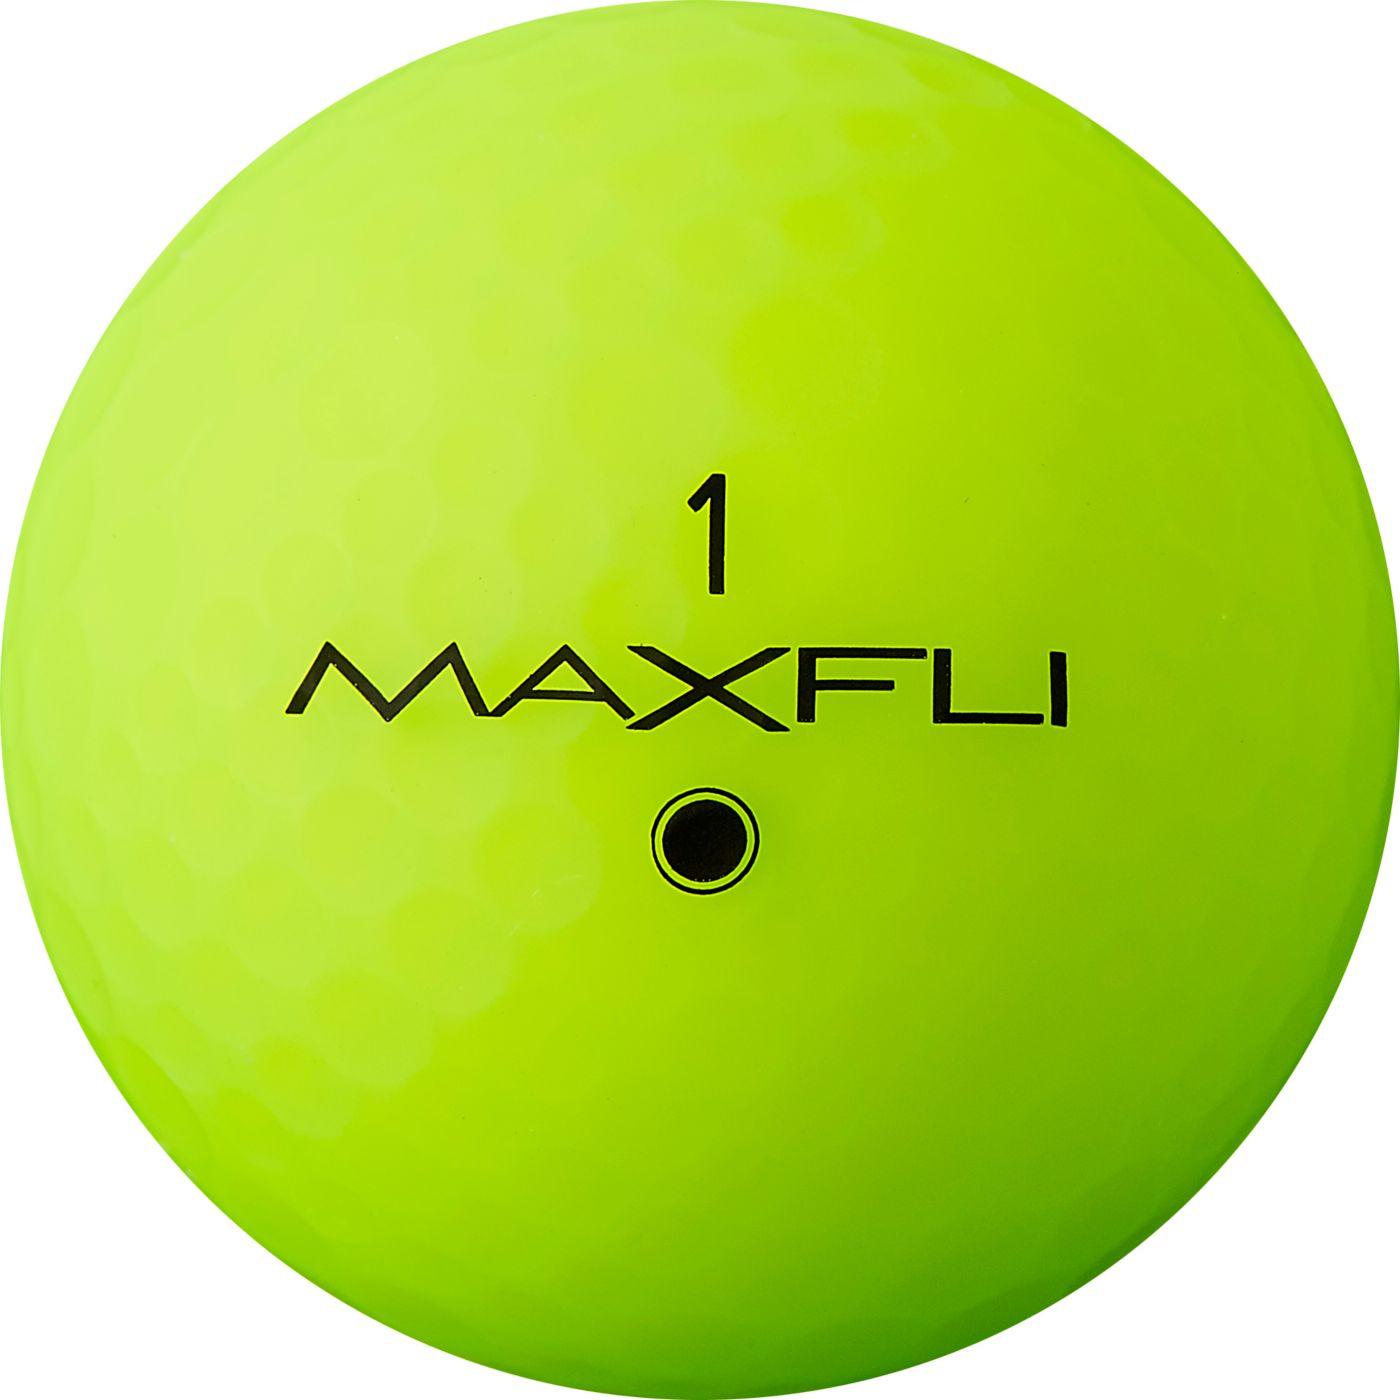 Maxfli StraightFli Matte Green Personalized Golf Balls